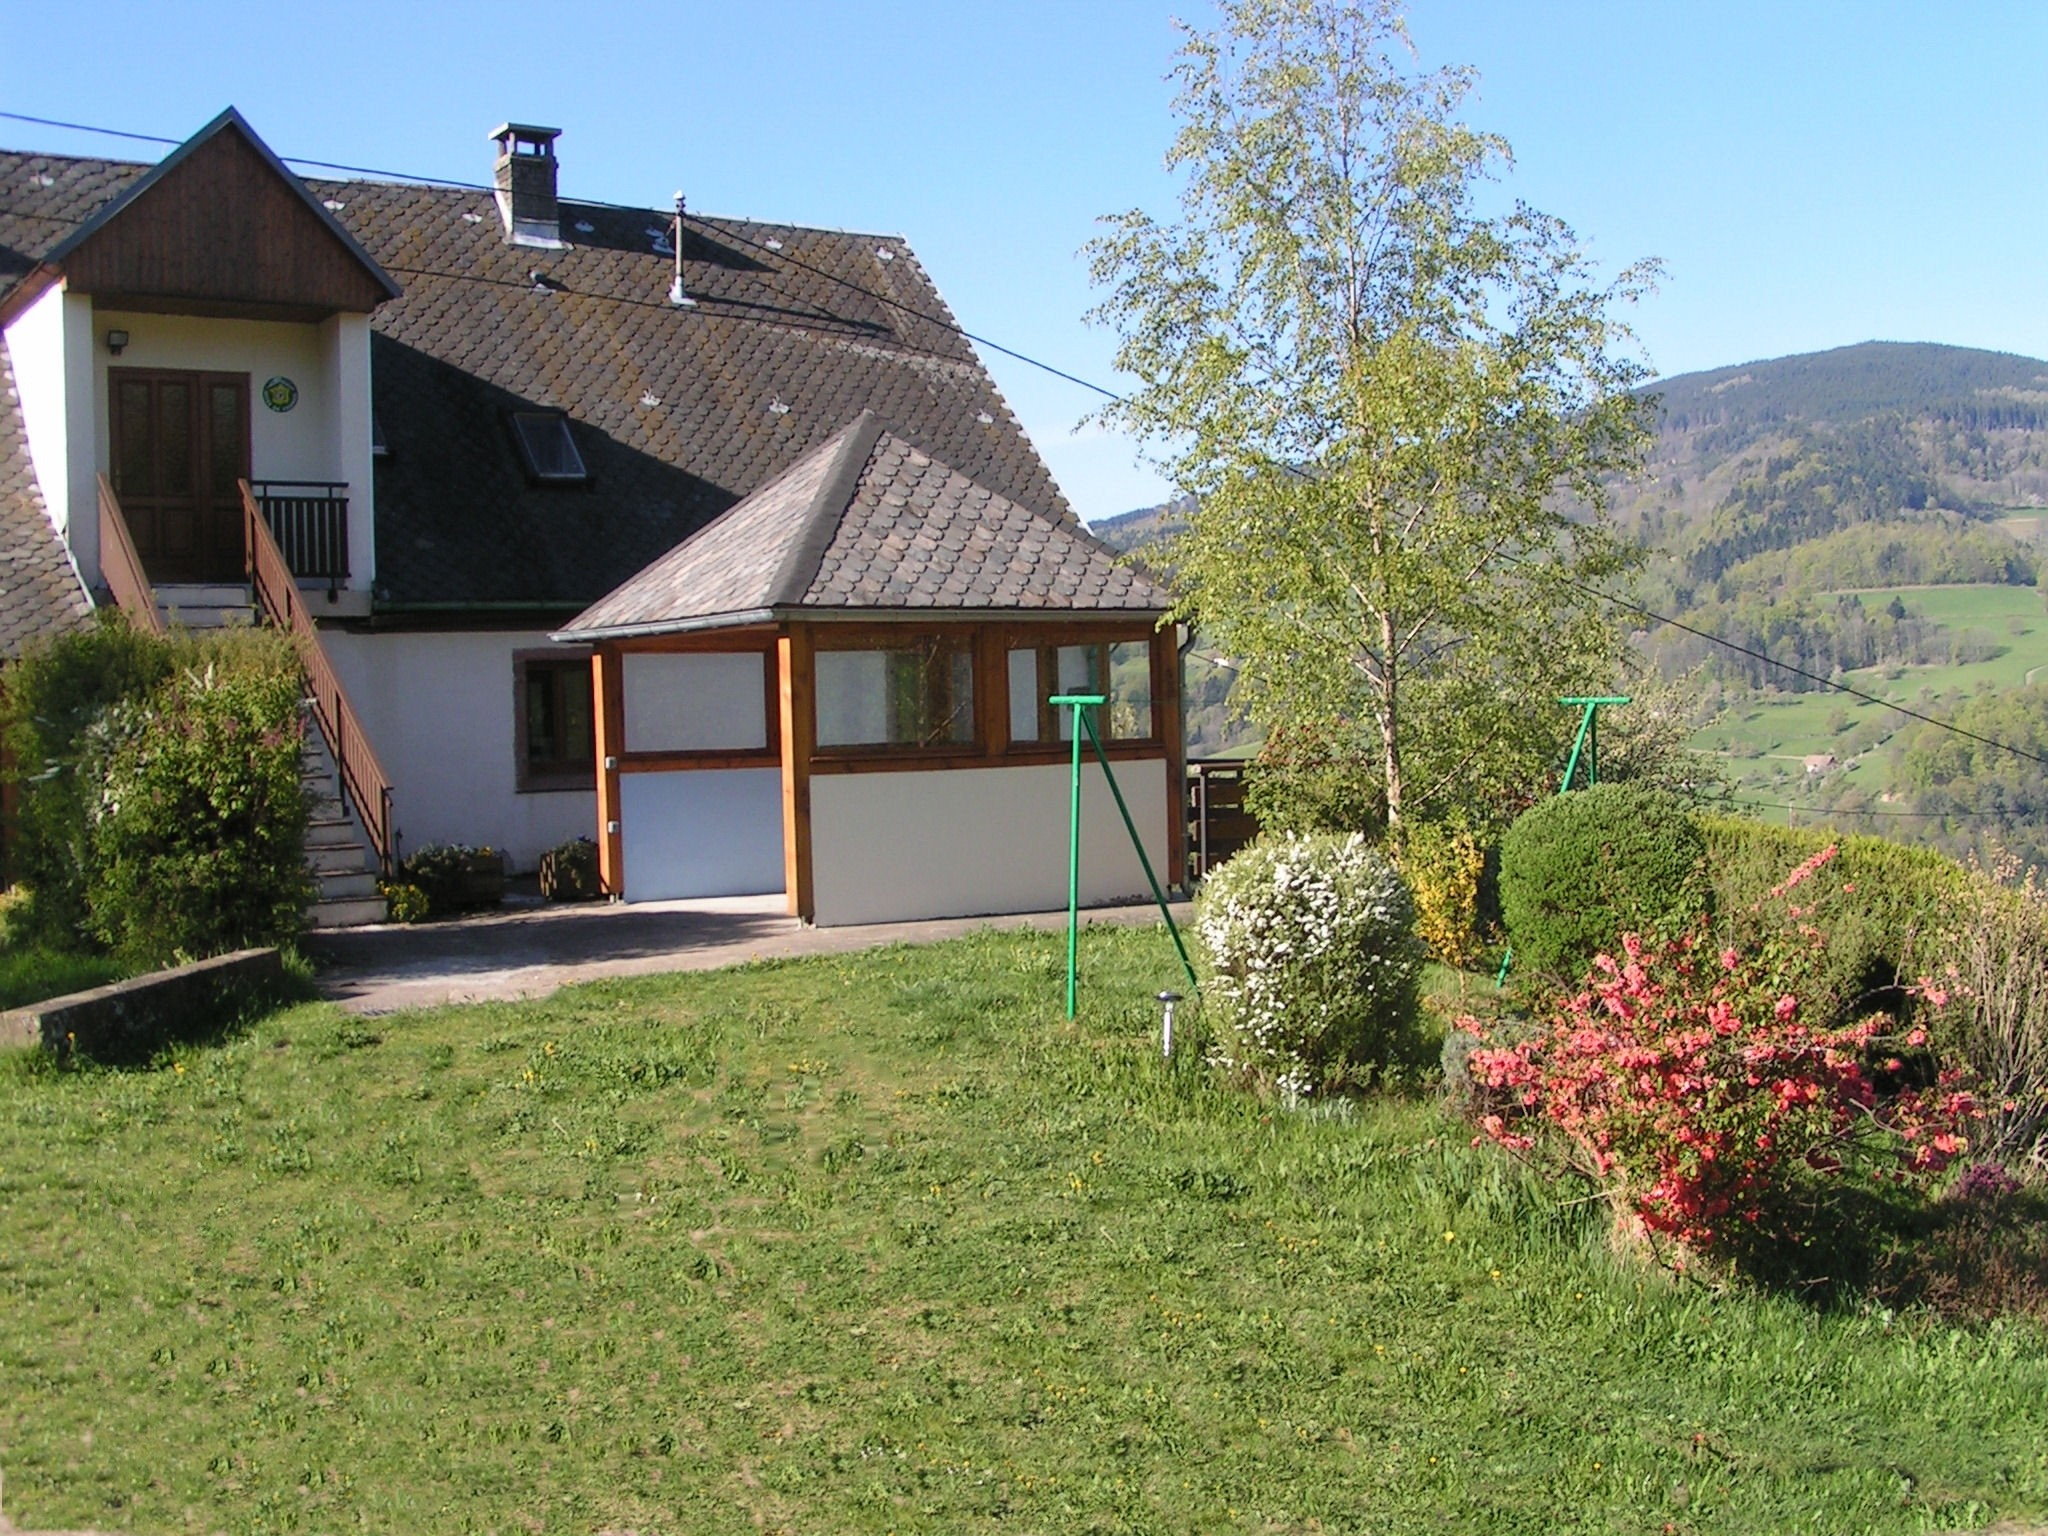 Location gite 3 en alsace a lapoutroie pres de kaysersberg for Piscine kaysersberg